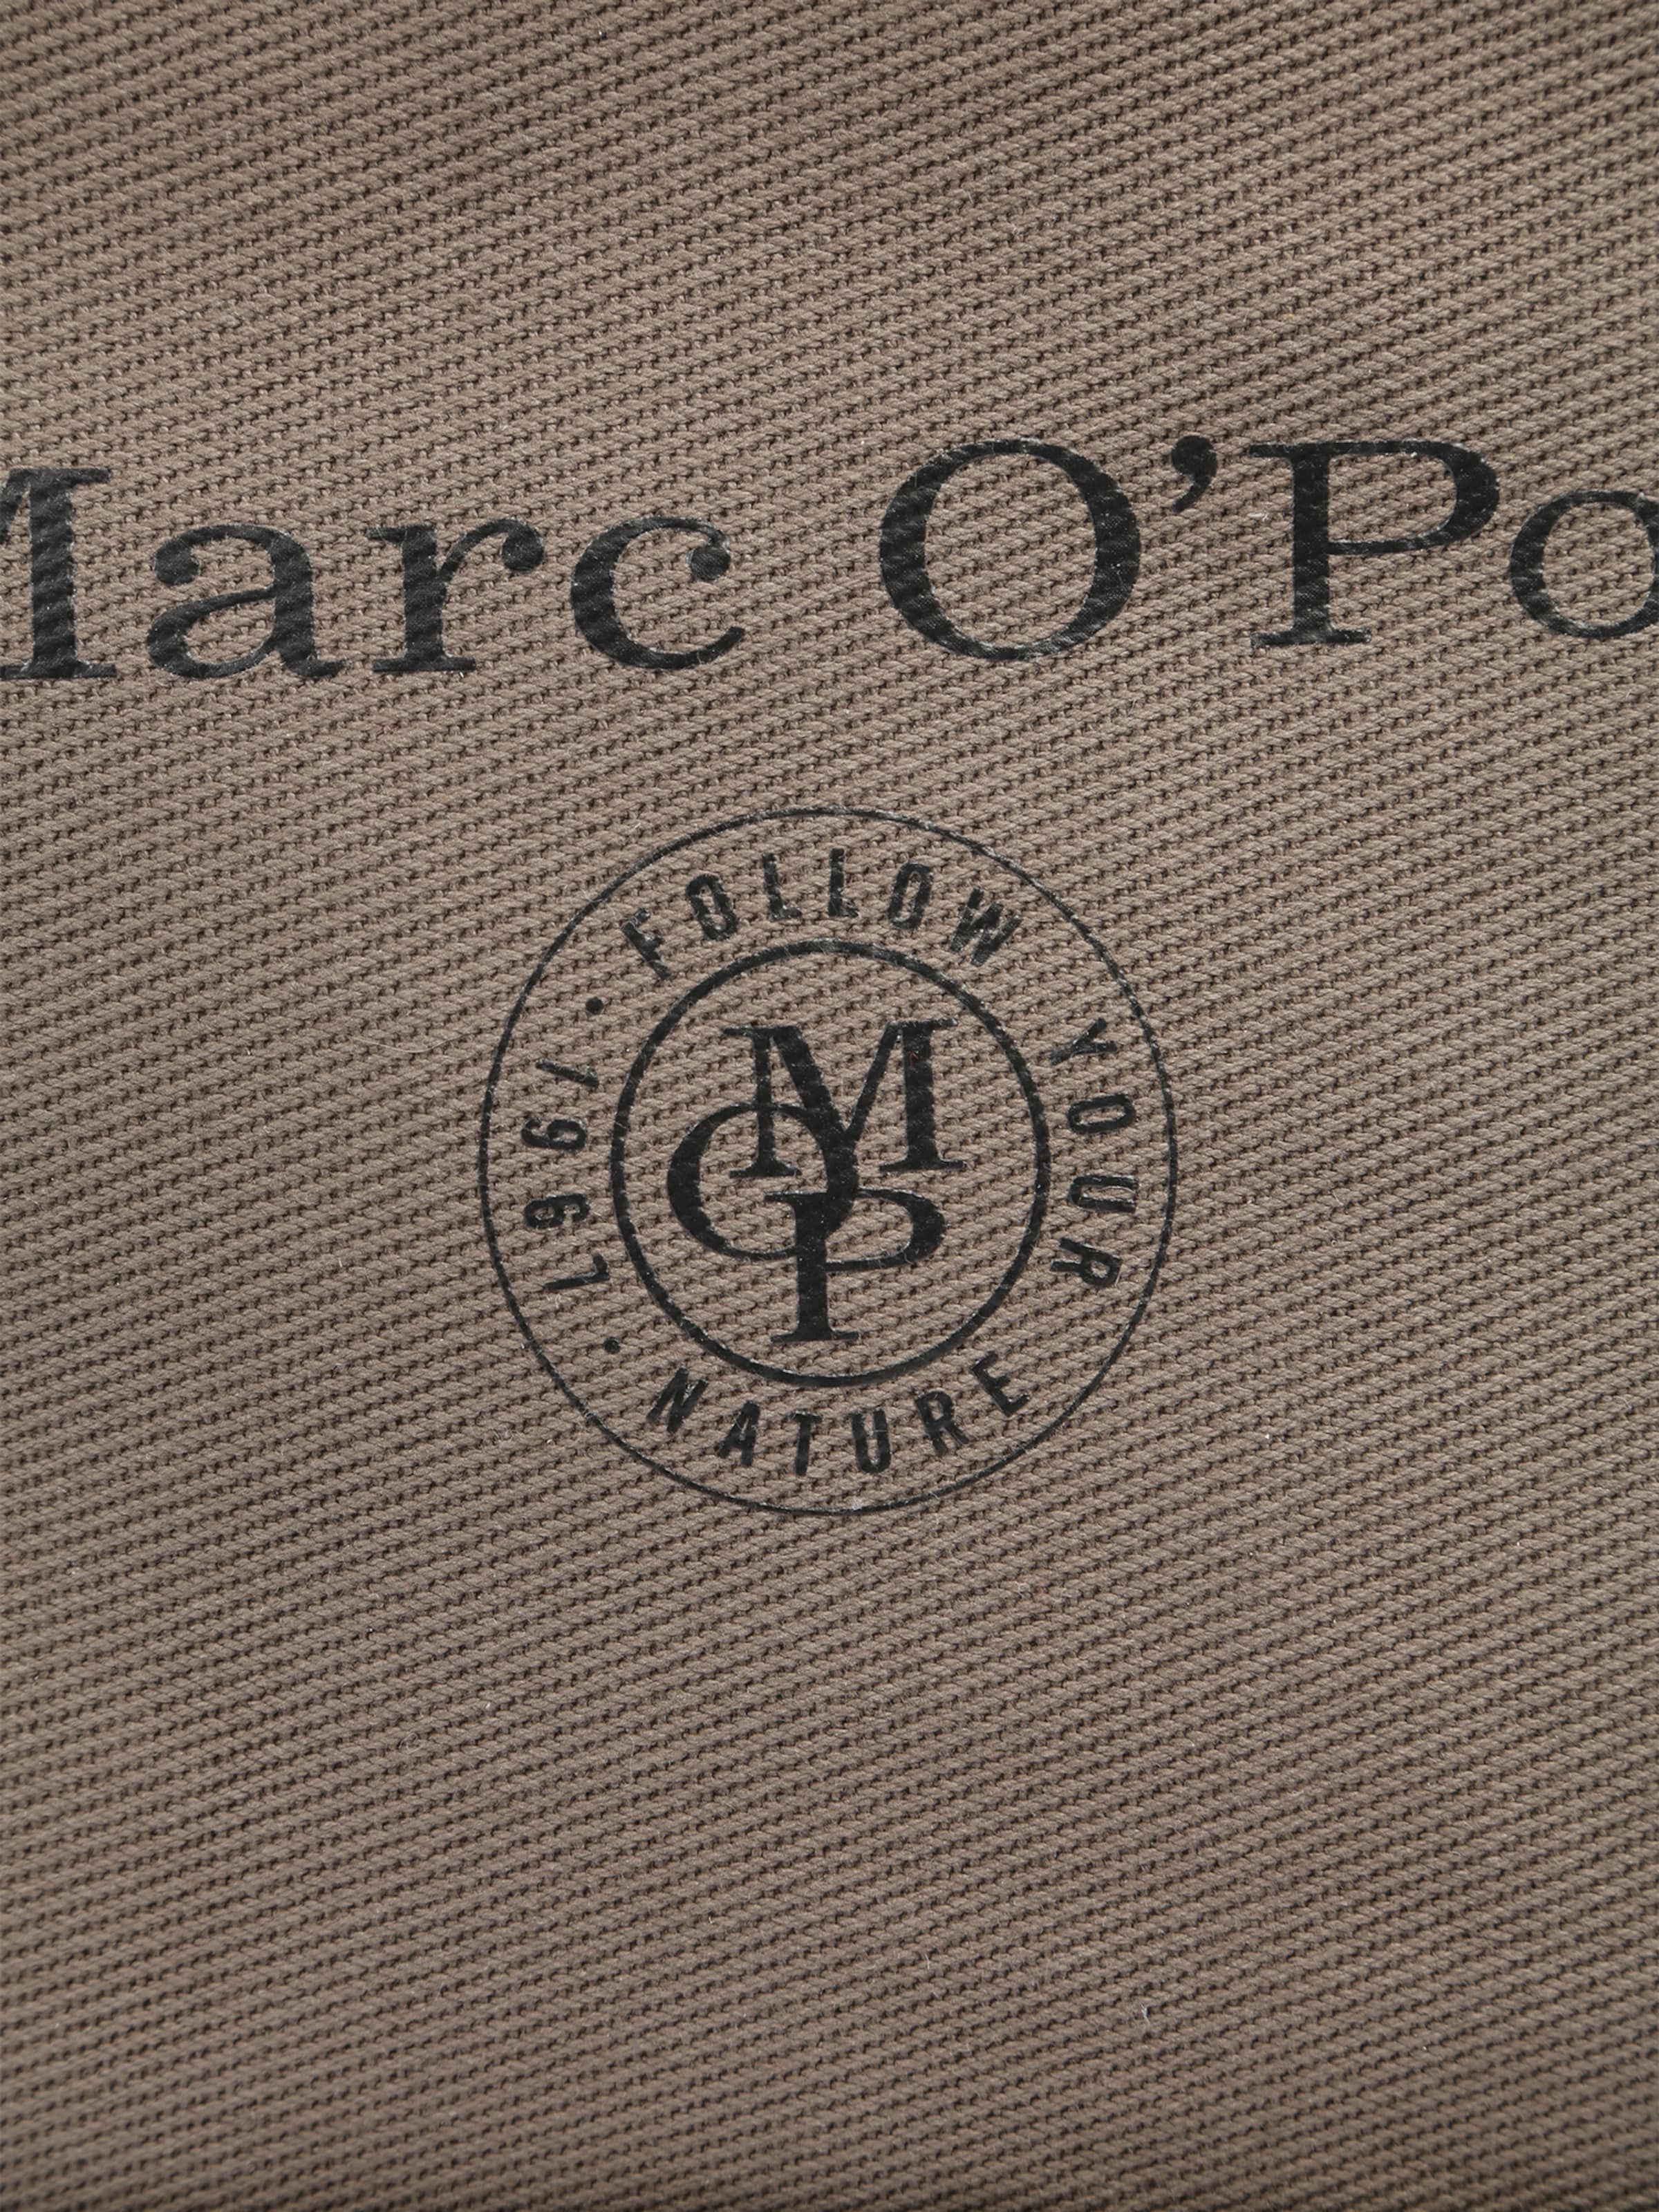 Marc Shopper O'Polo Shopper 'Ninetyeight' 'Ninetyeight' Marc O'Polo Epn7Tqw1Zx